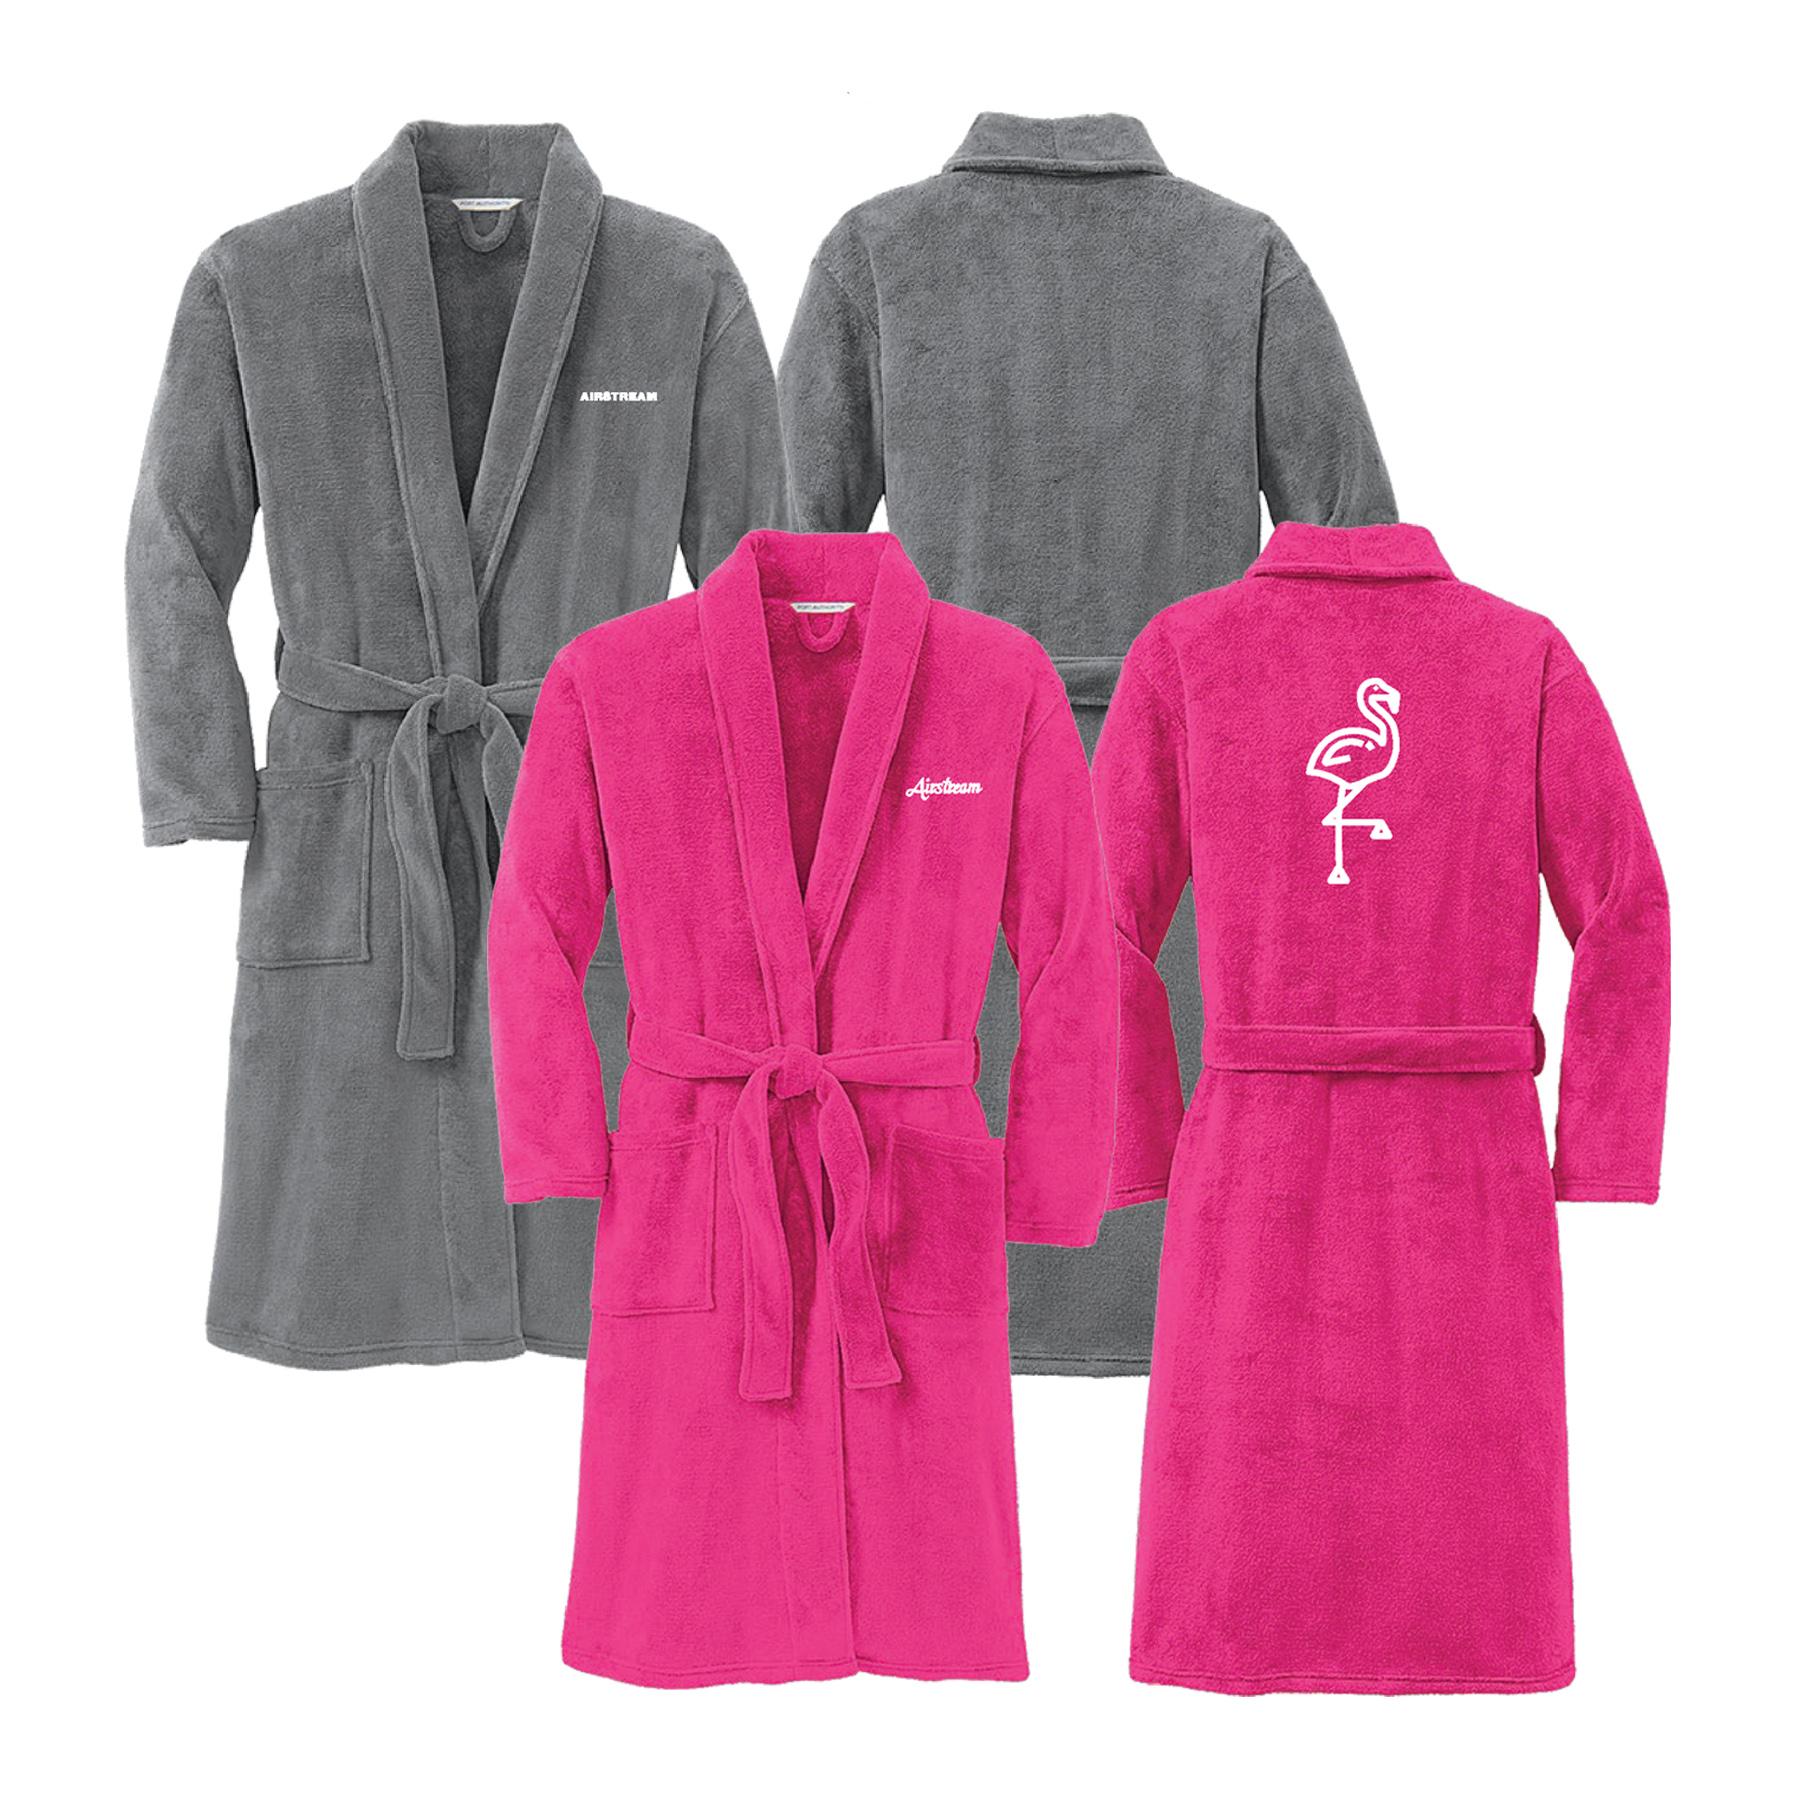 studio eleven bathrobes robes both colors